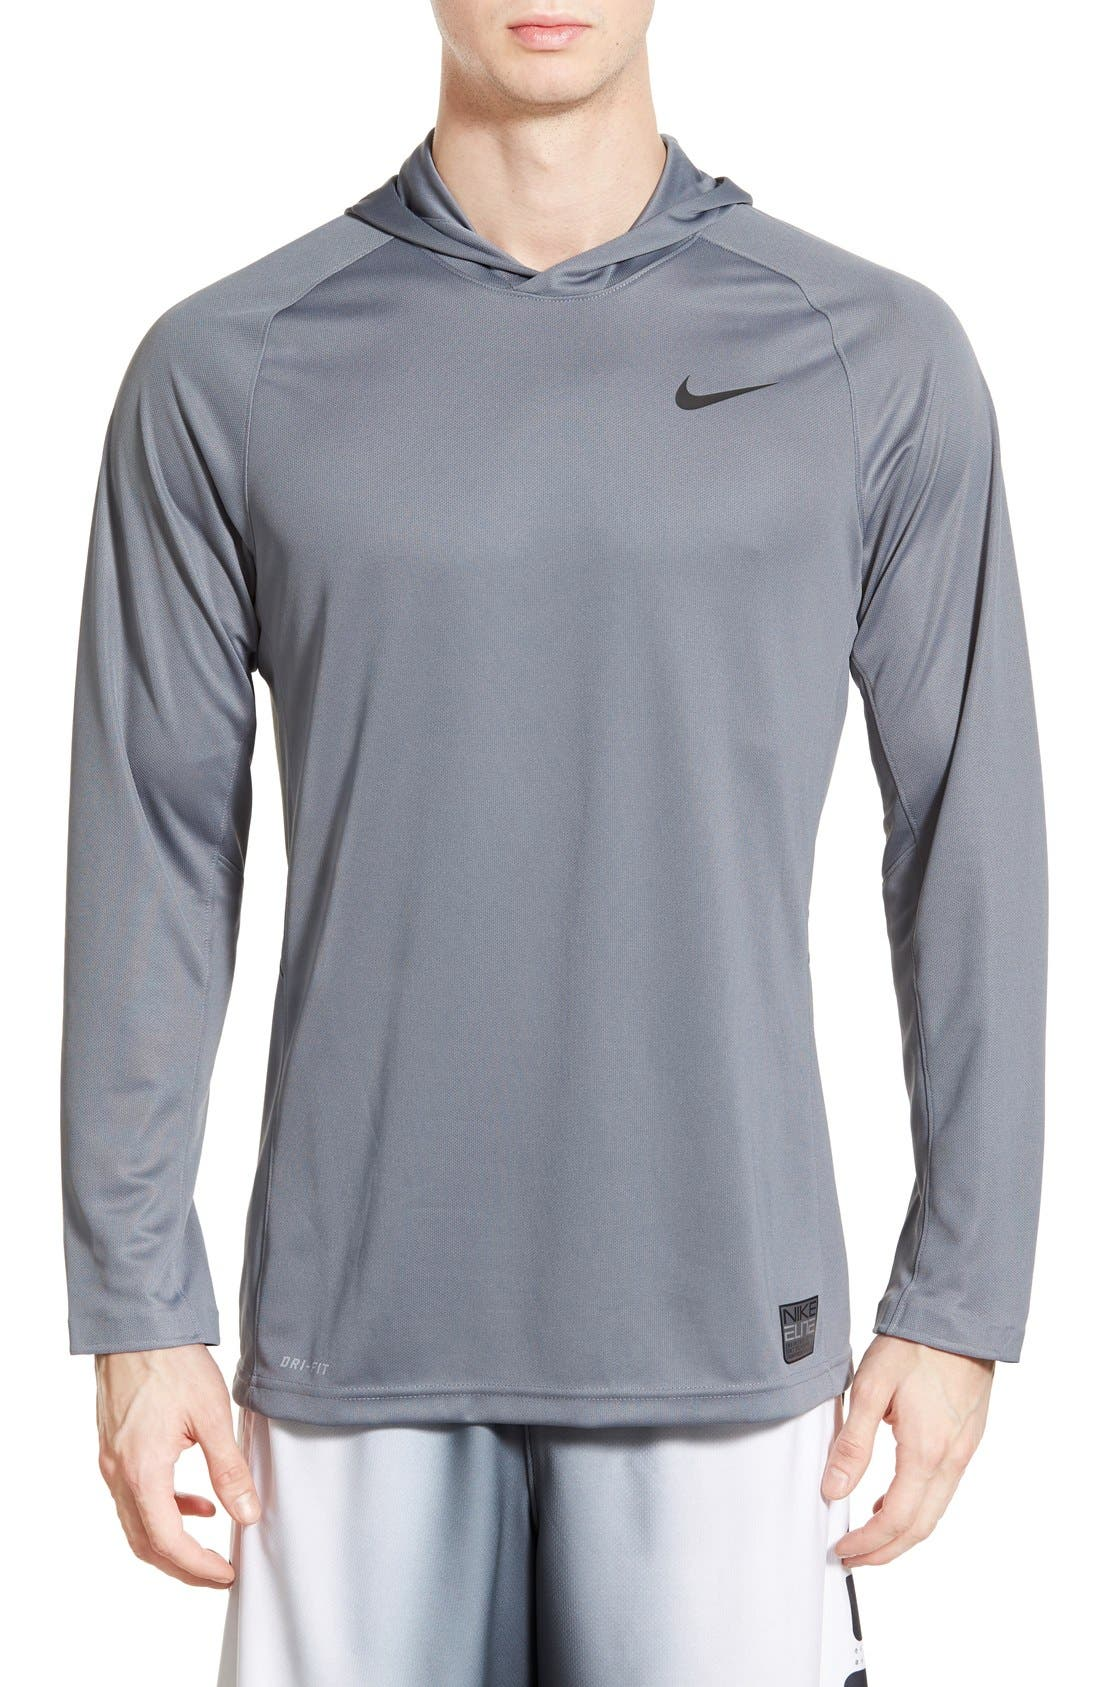 Main Image - Nike 'Elite Shooter - Dri-FIT' Long Sleeve Hooded Basketball Shirt